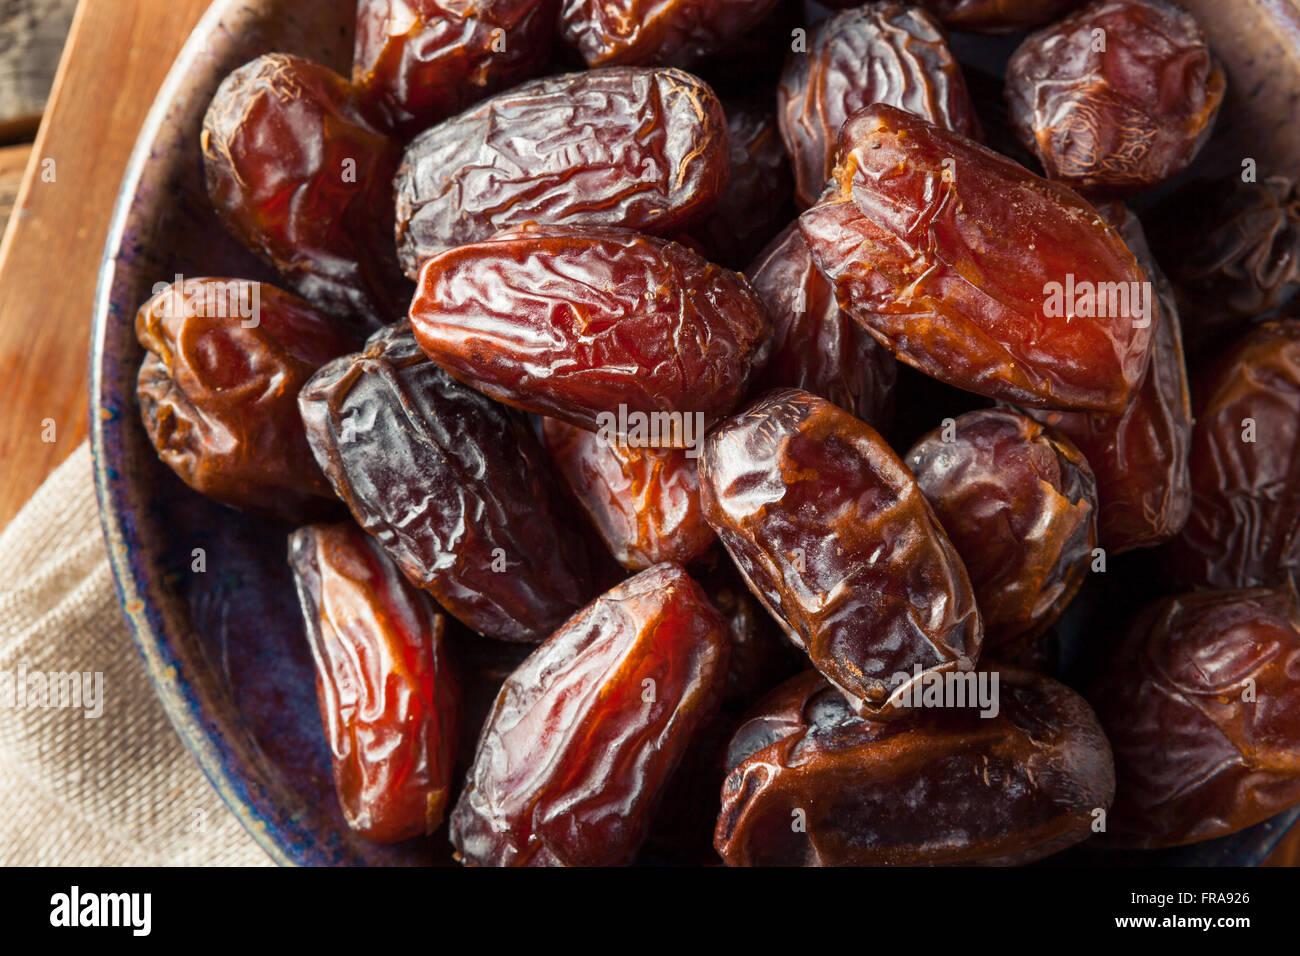 Raw Organic Medjool Dates Ready to Eat - Stock Image